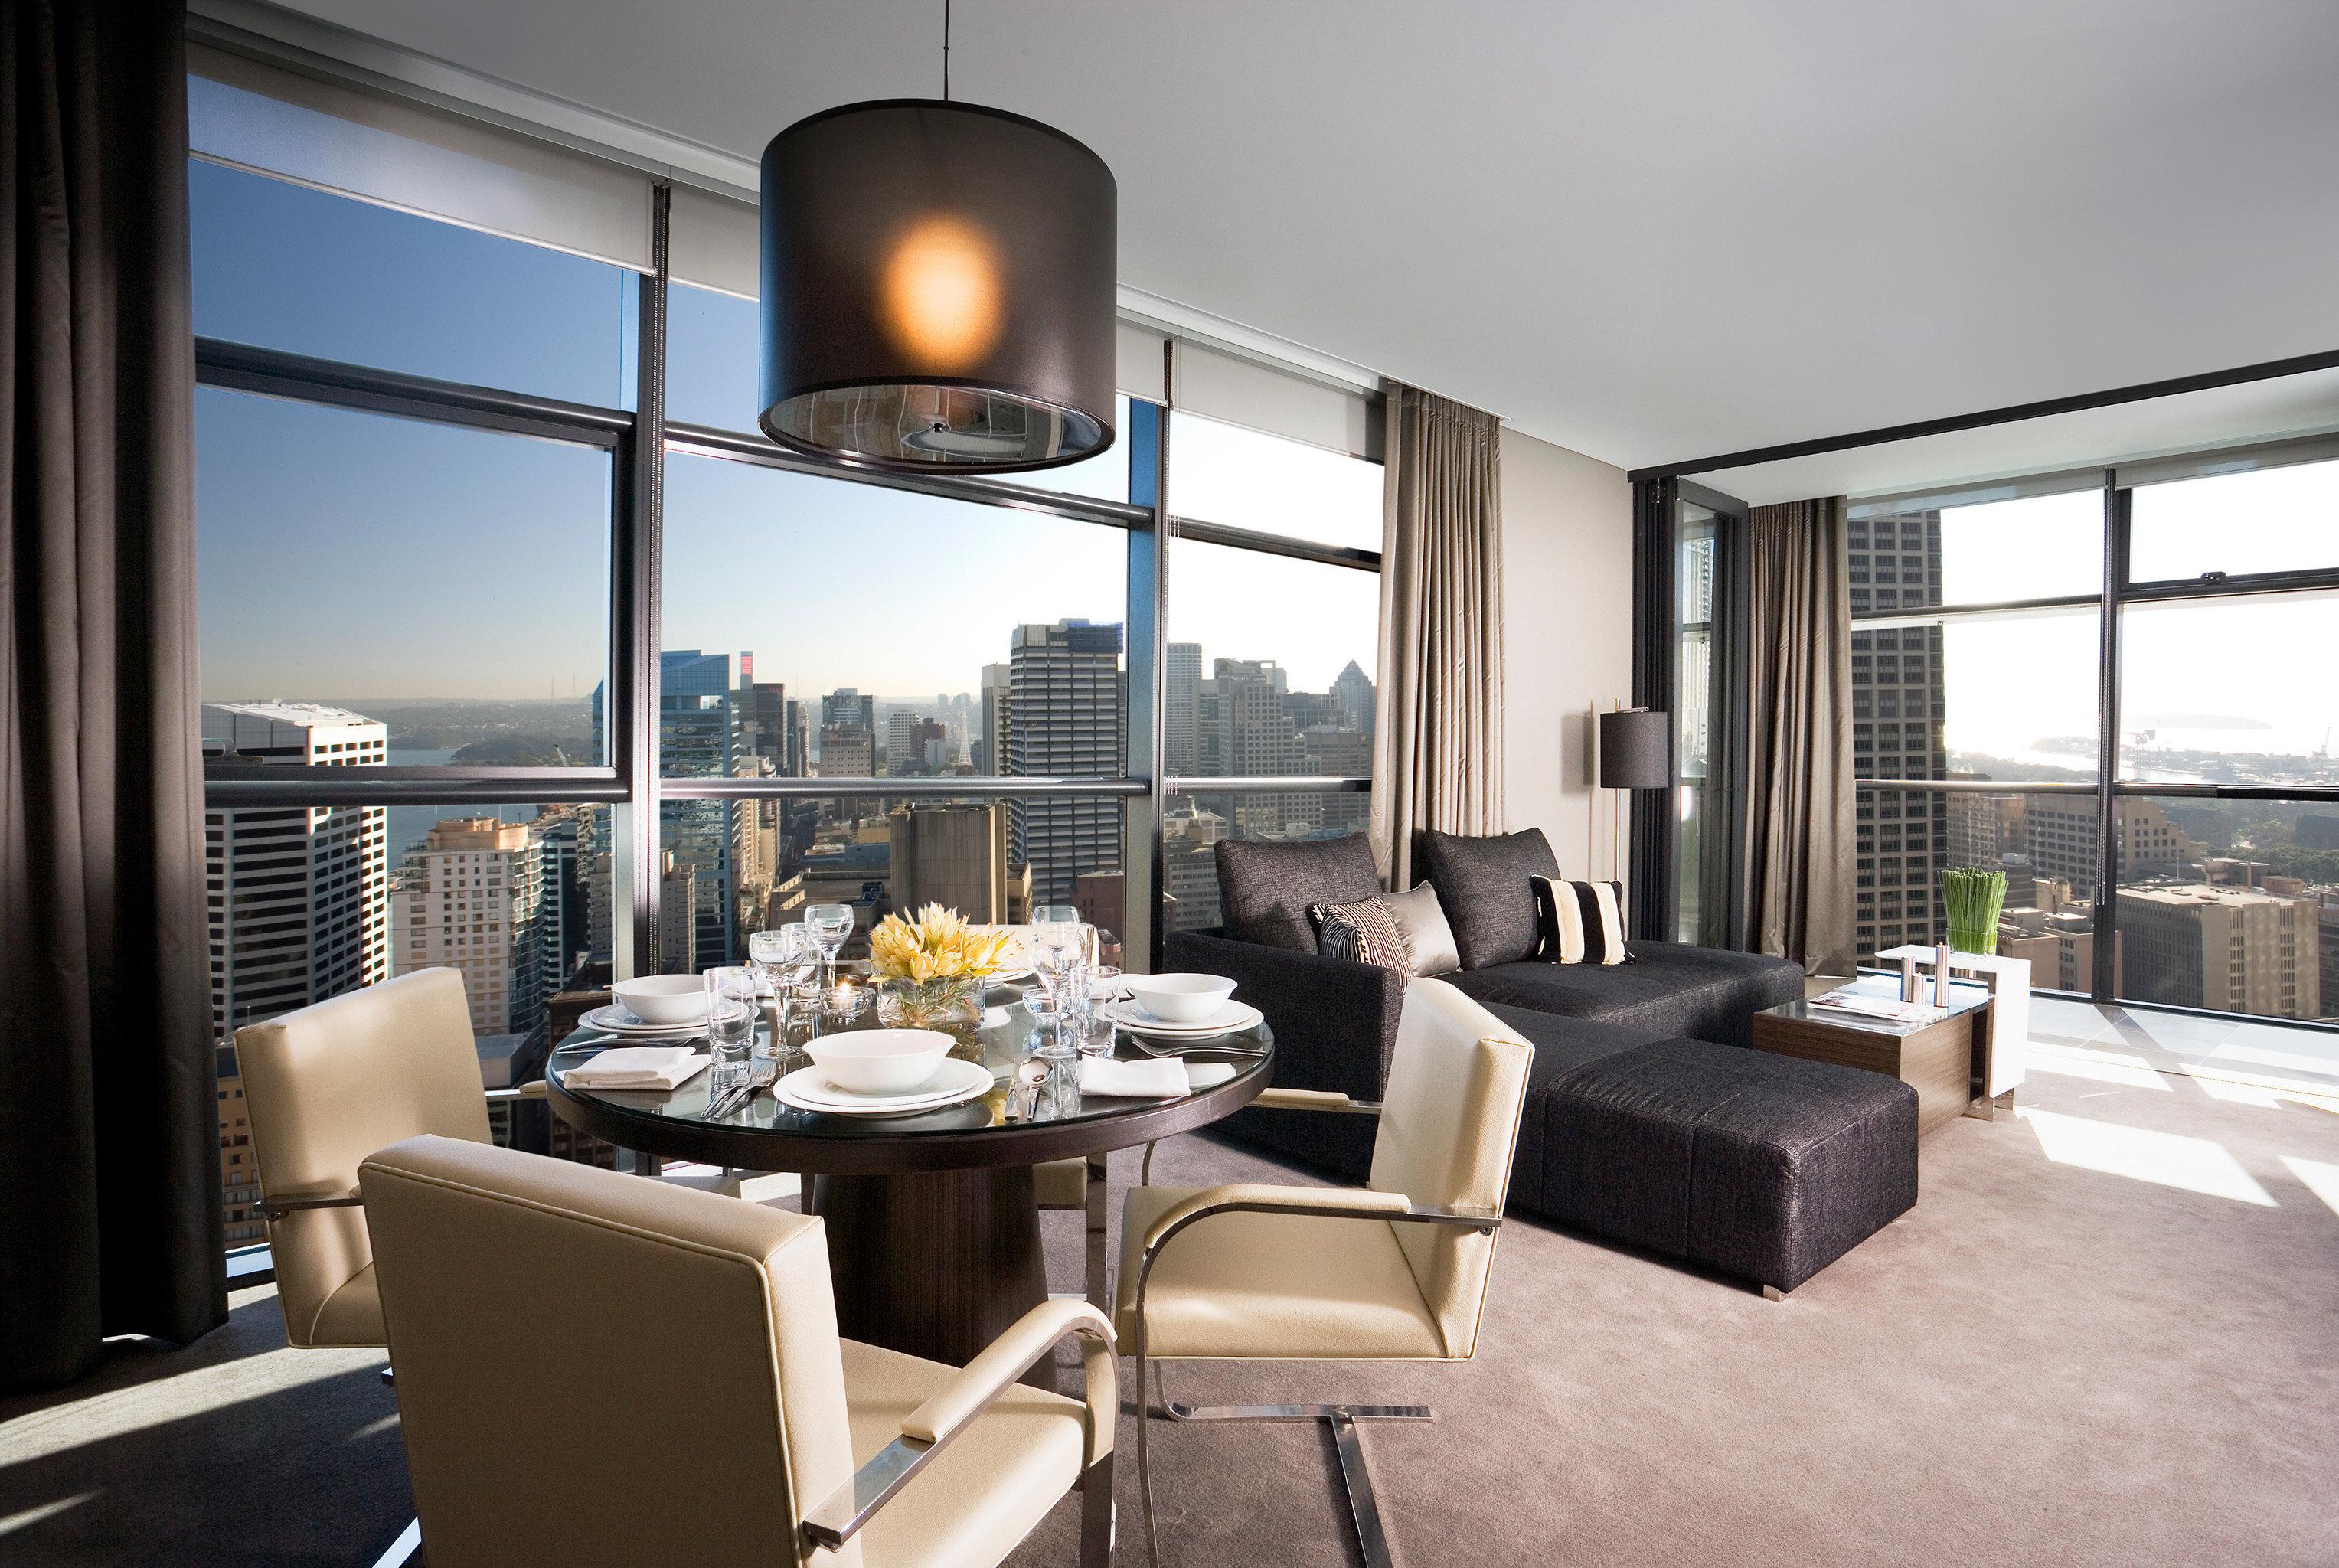 Bar Dining Drink Eat Luxury Modern living room property condominium home lighting Suite